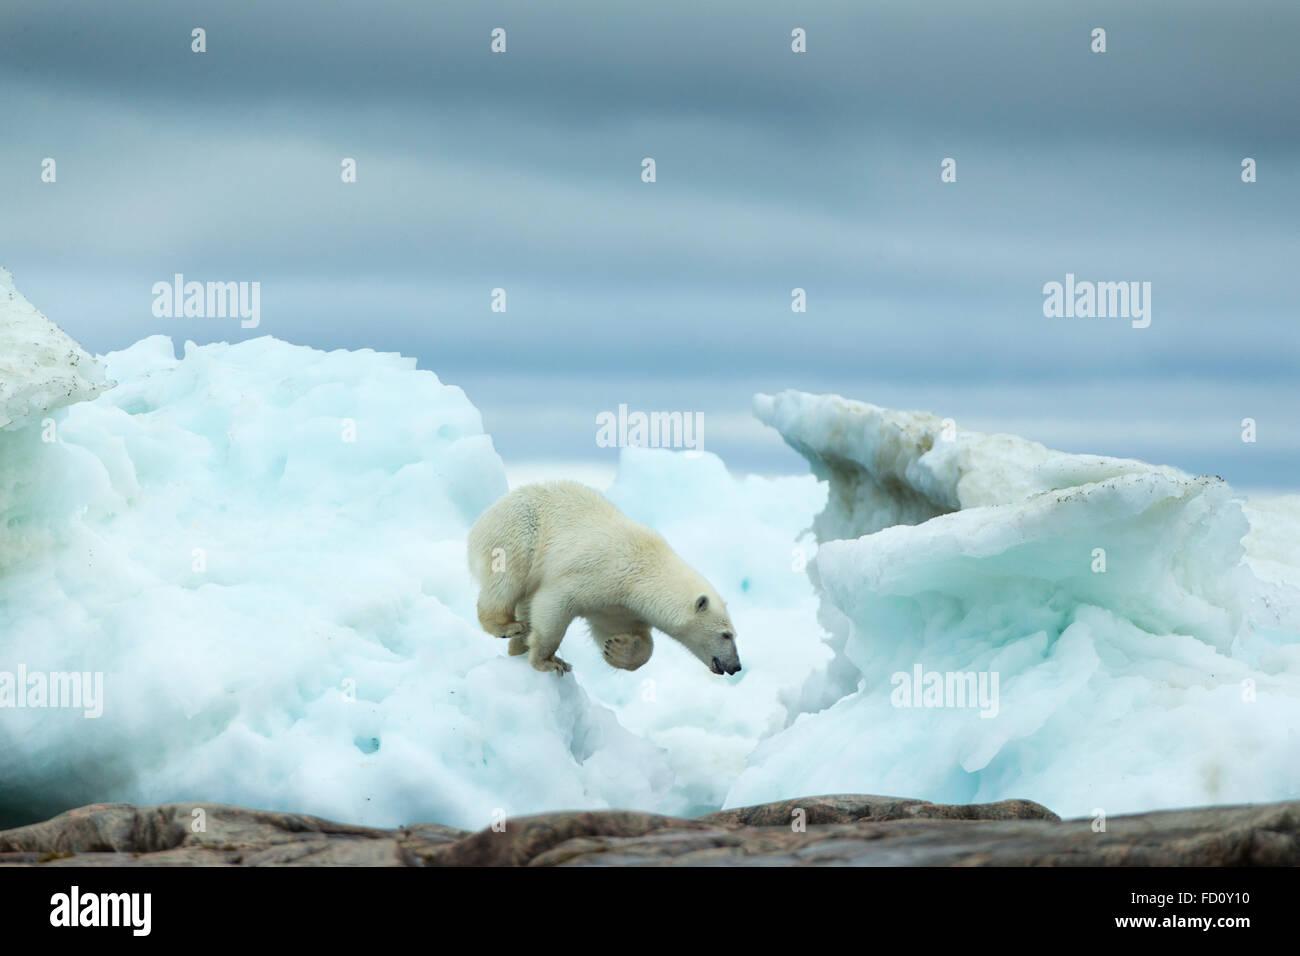 Canada, Nunavut Territory, Repulse Bay, Polar Bear (Ursus maritimus) running amid melting sea ice near Harbour Islands - Stock Image